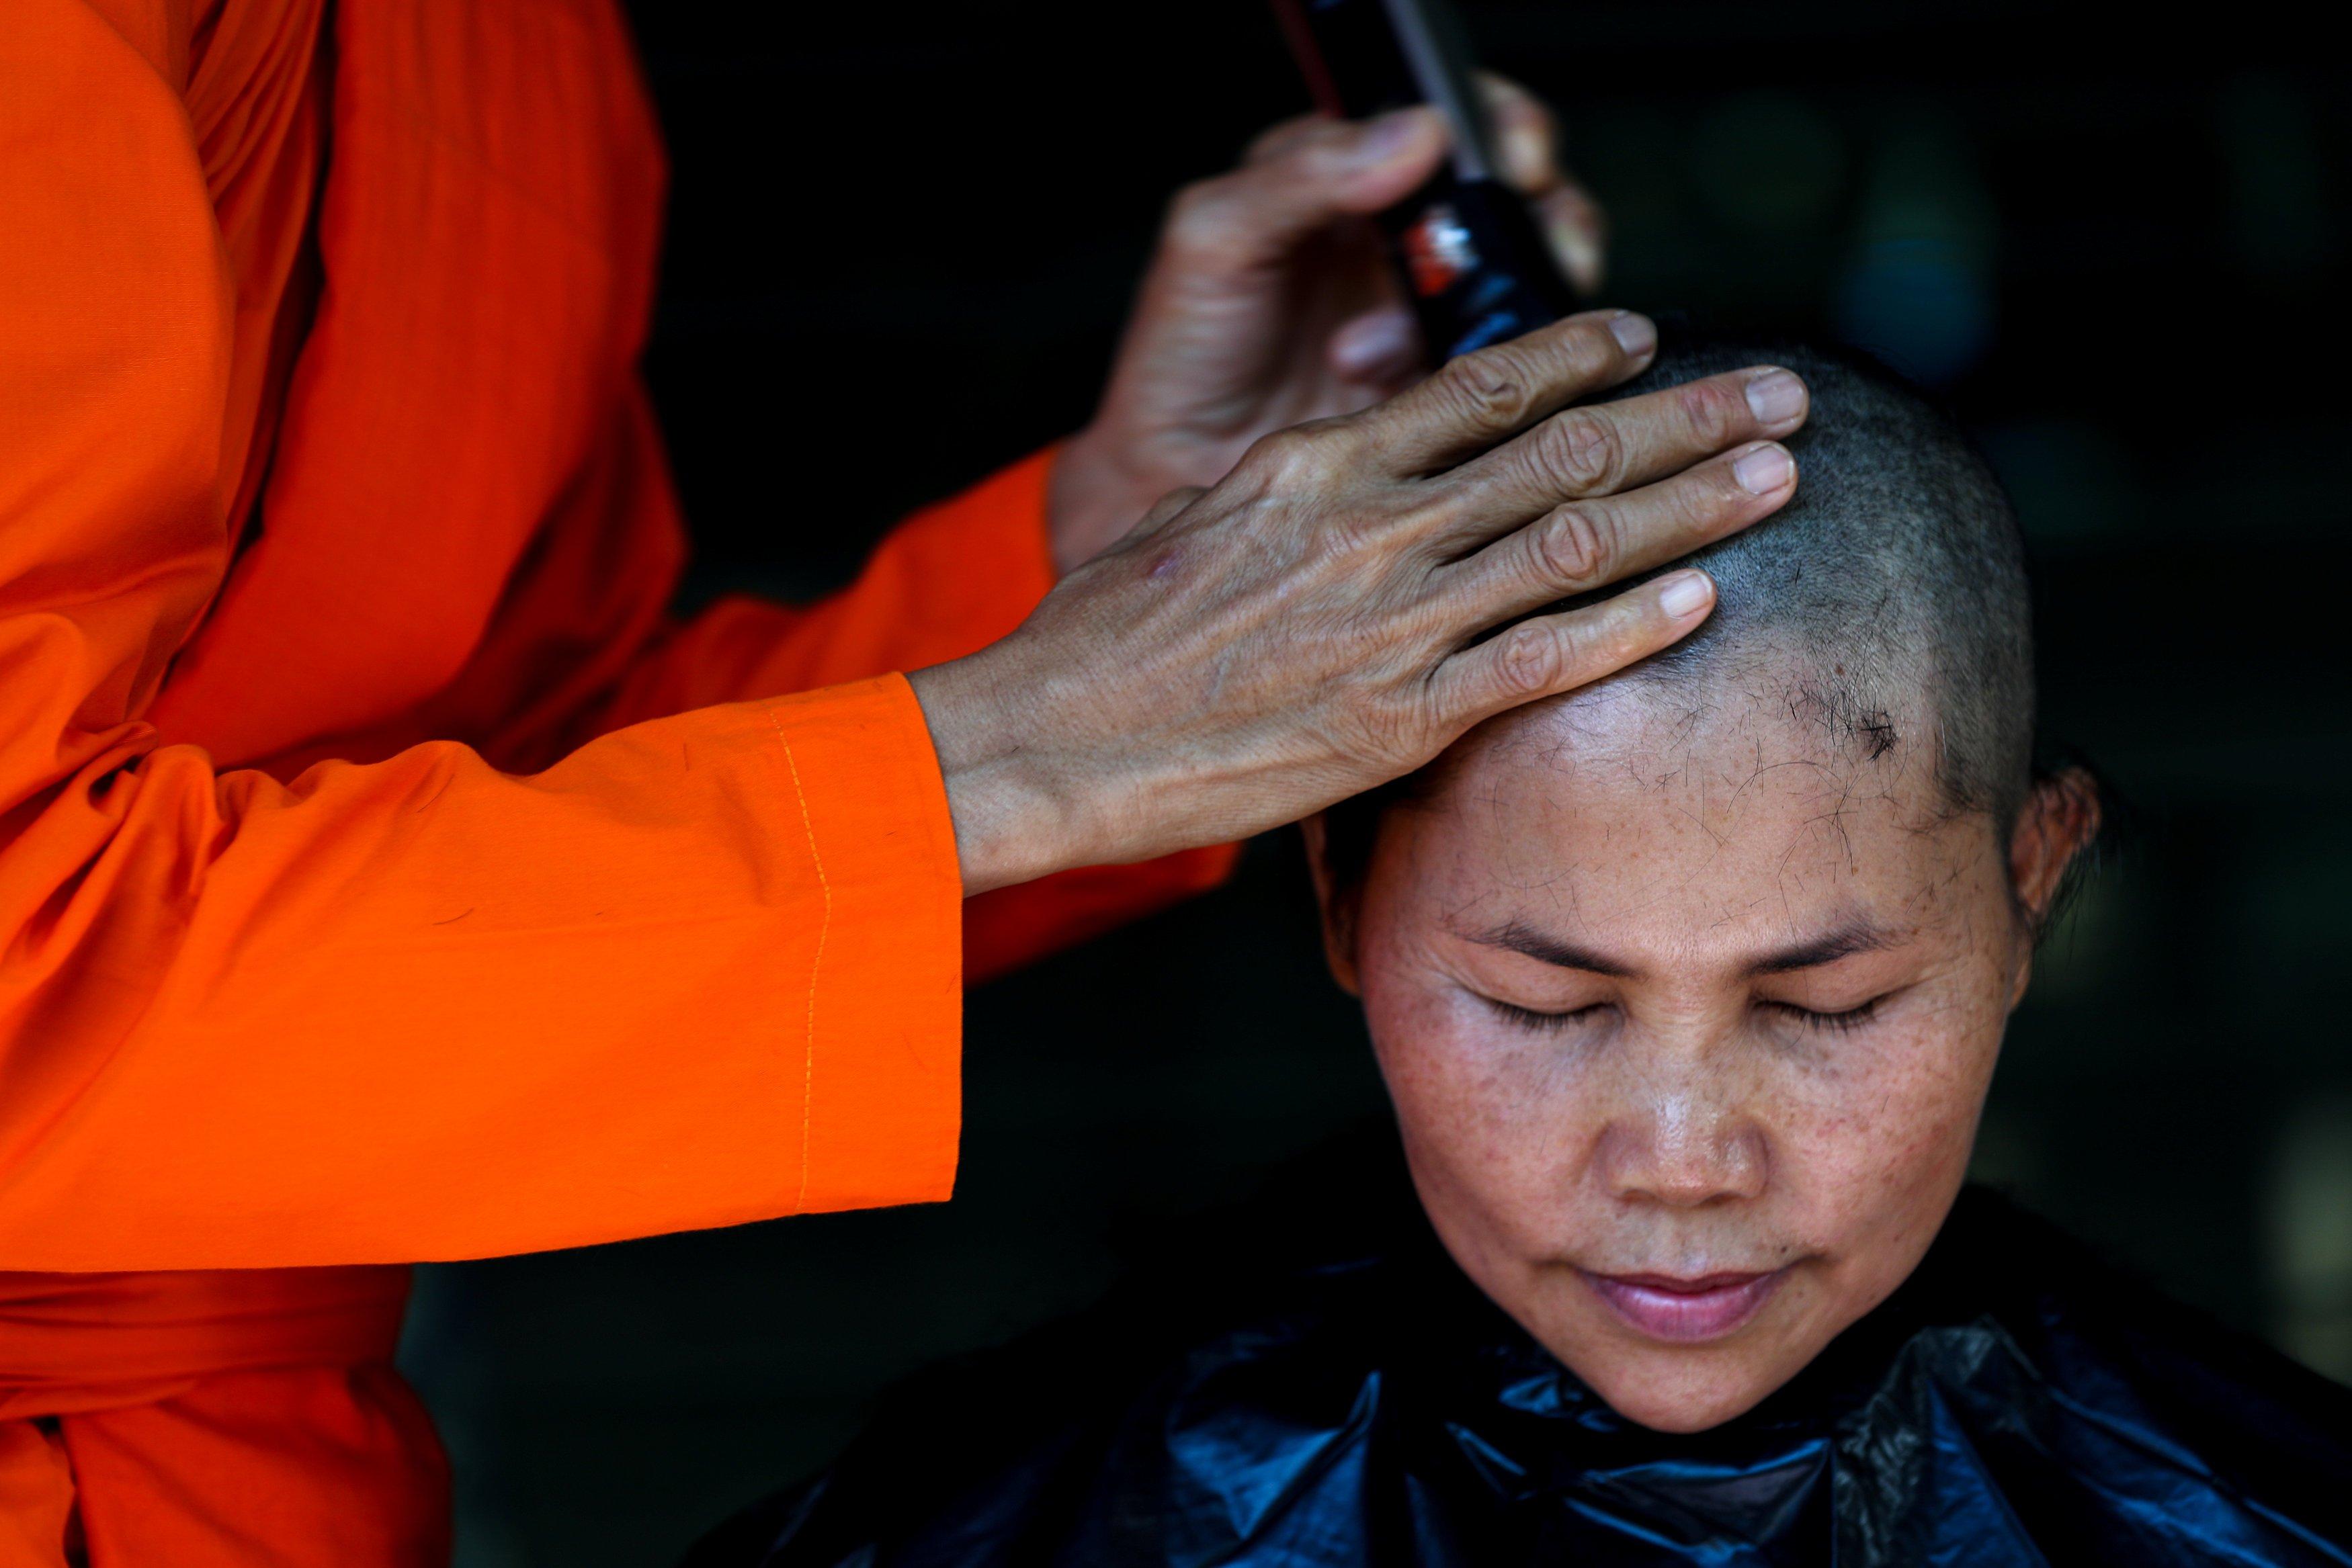 Thailand's rebel female Buddhist monks defy tradition